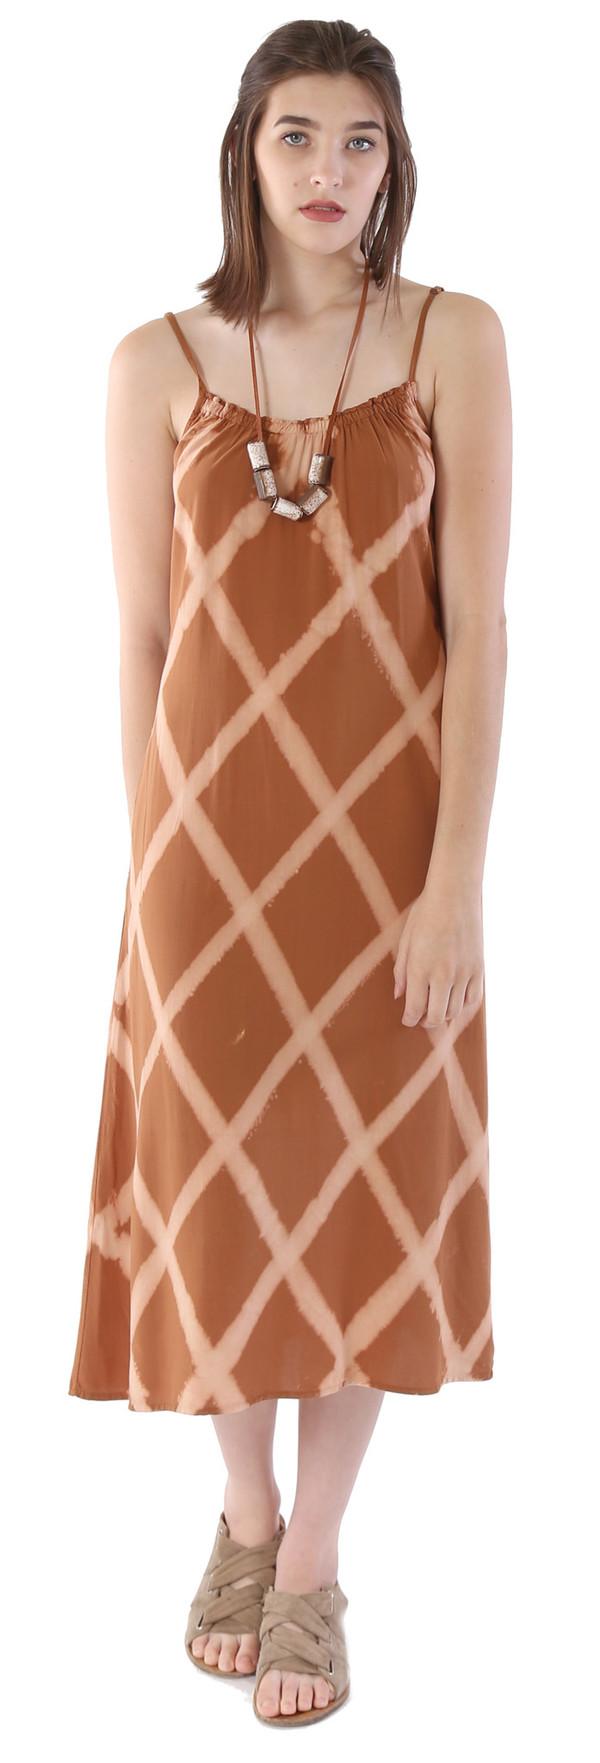 THE ODELLS Triangle Keyhole Dress